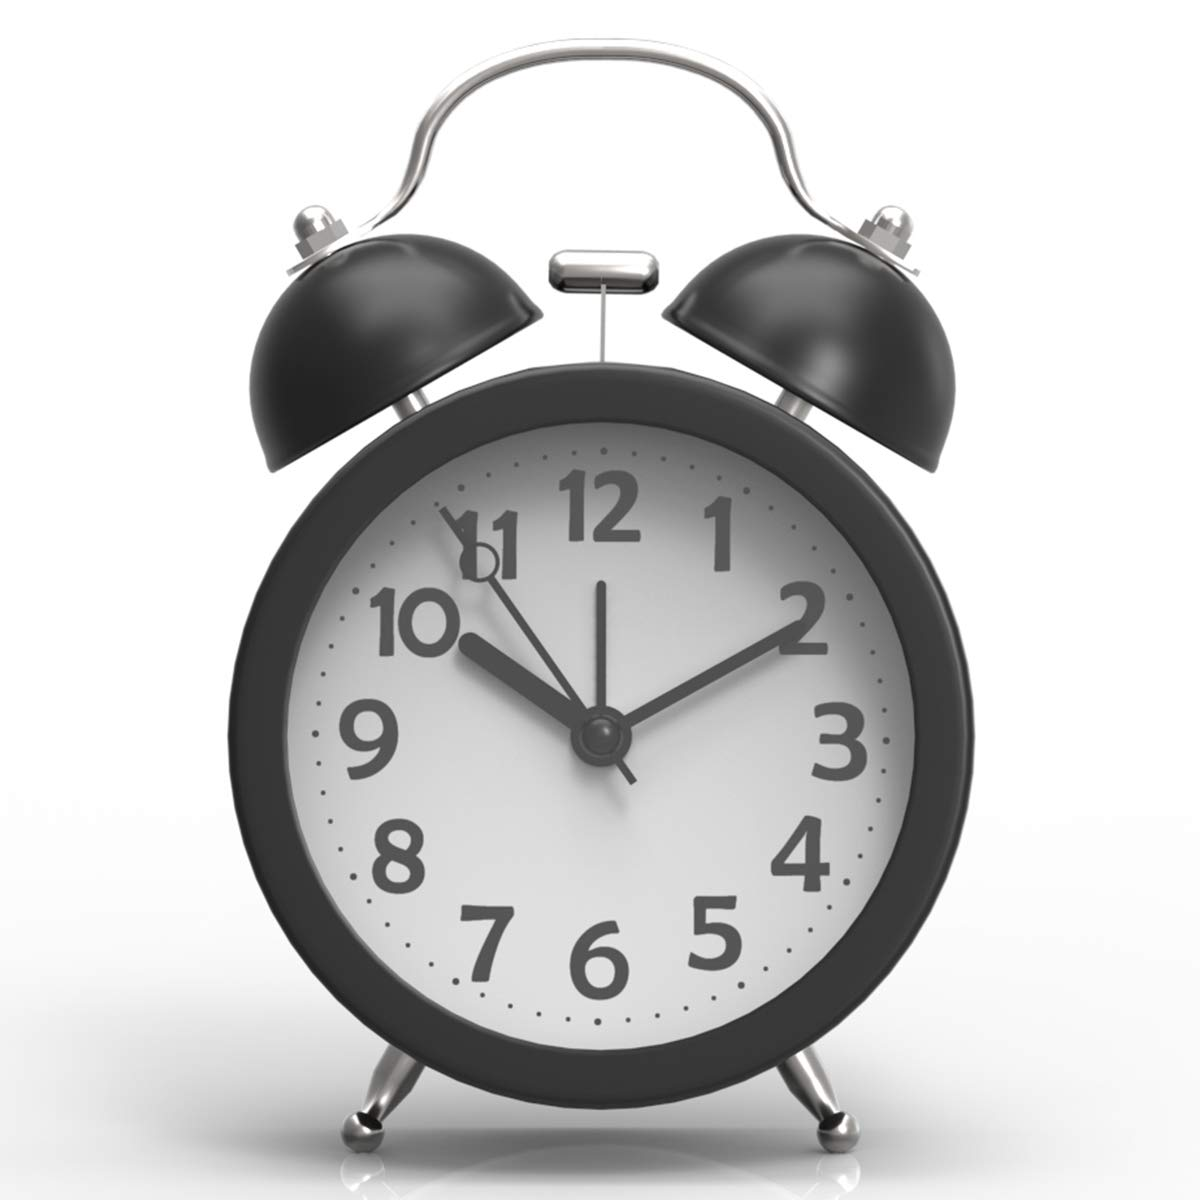 Despertador Redondo con dos Campanillas y de Volumen Superalta de Consumo de Bater/ía Verde PiLife Mini Silencioso de 3 Pulgadas del Estilo Cl/ásico con Retroiluminaci/ón